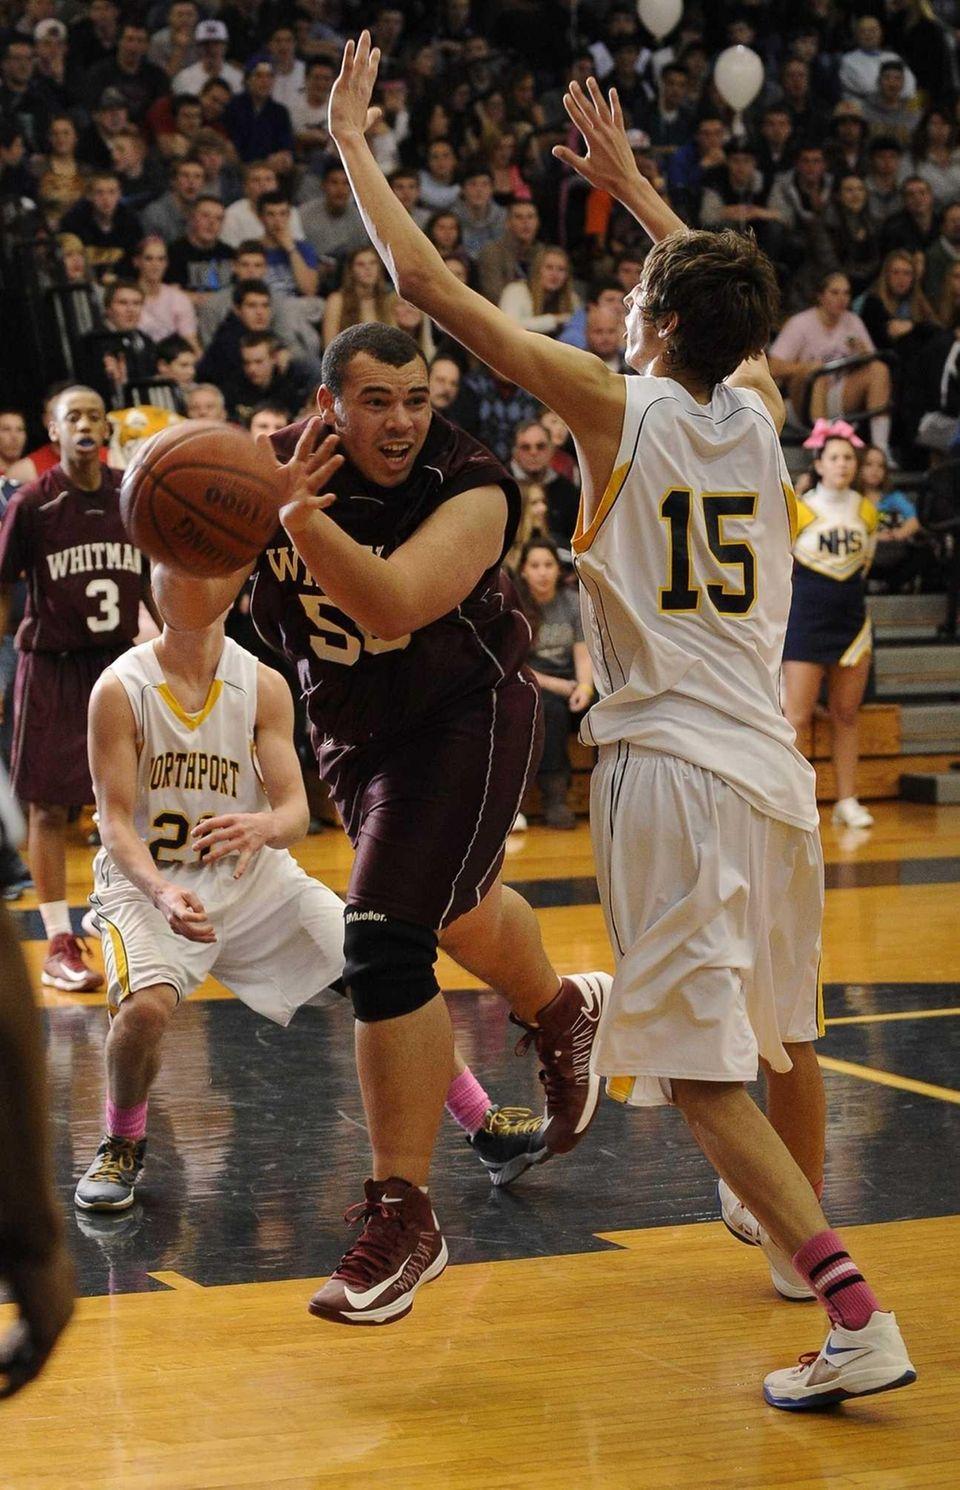 Whitman's Kieran Elmore passes the ball as Northport's